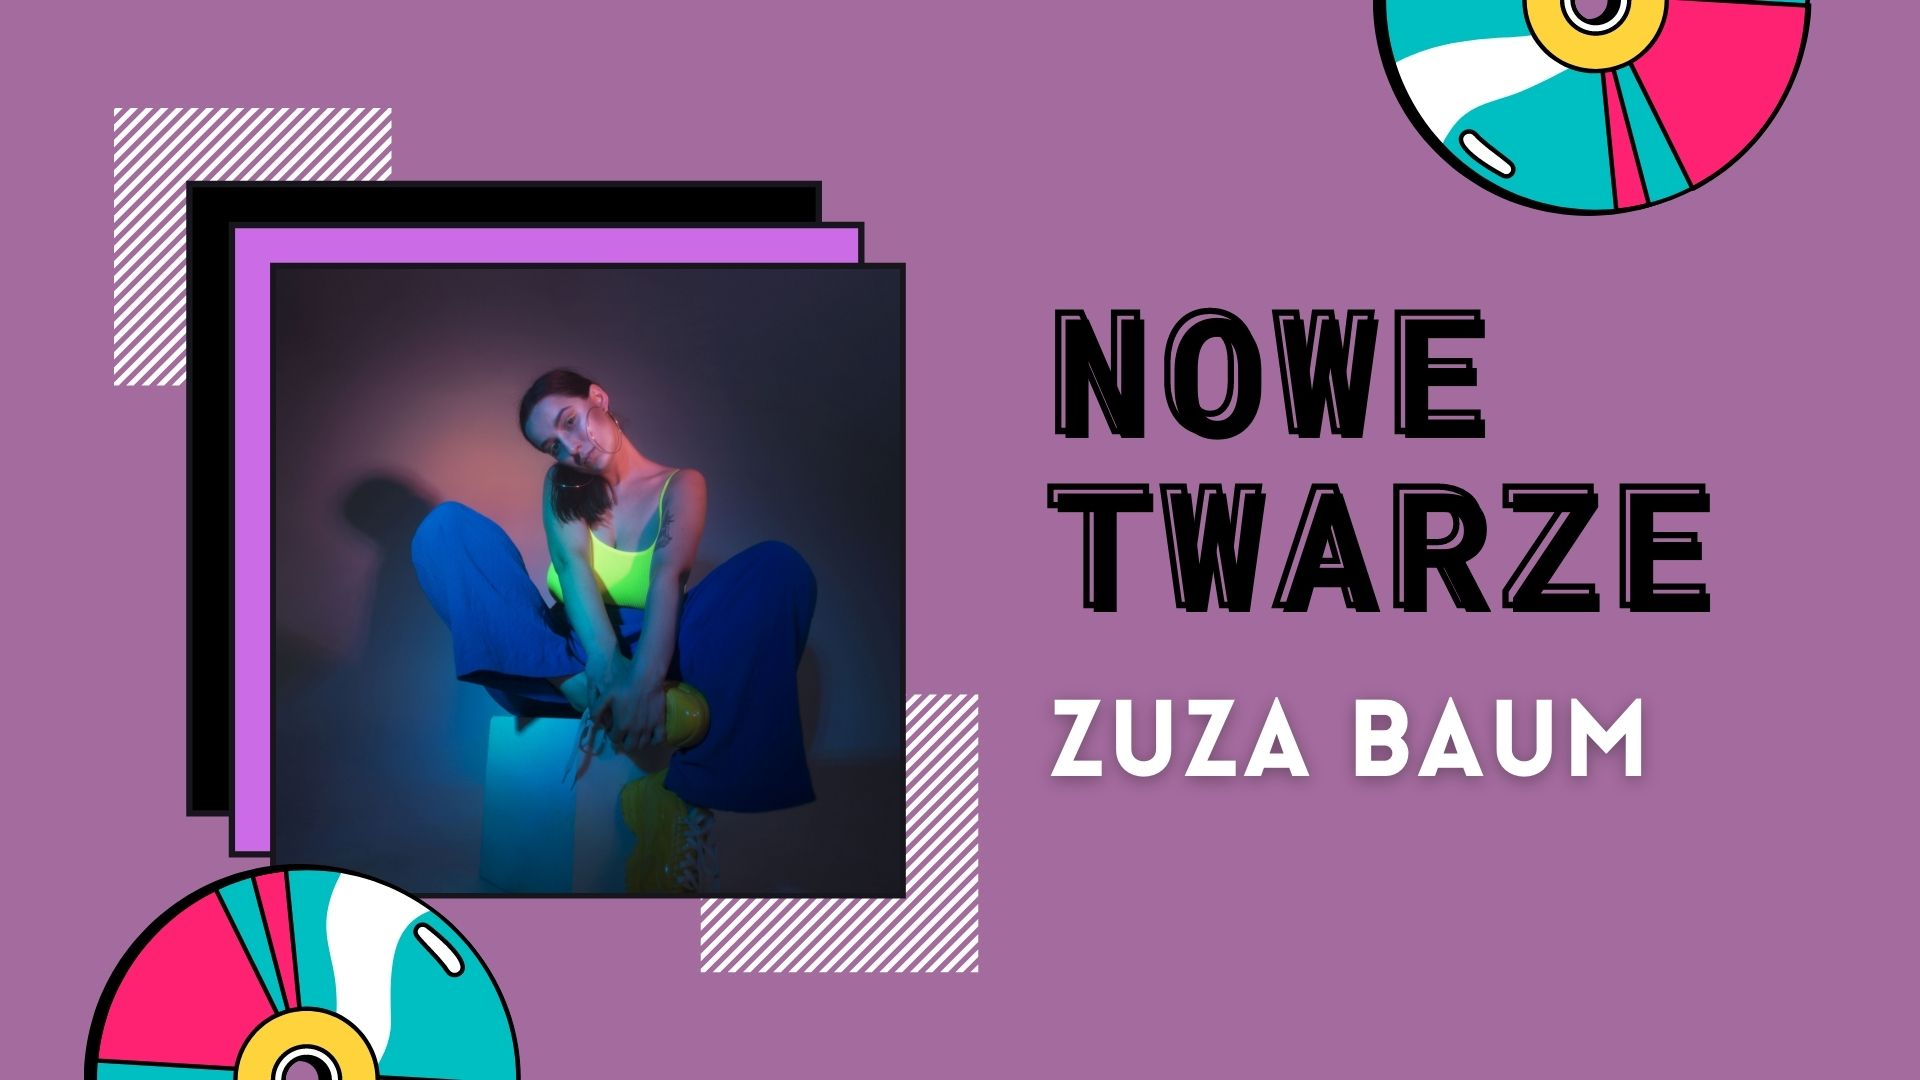 NOWE TWARZE    Zuza Baum